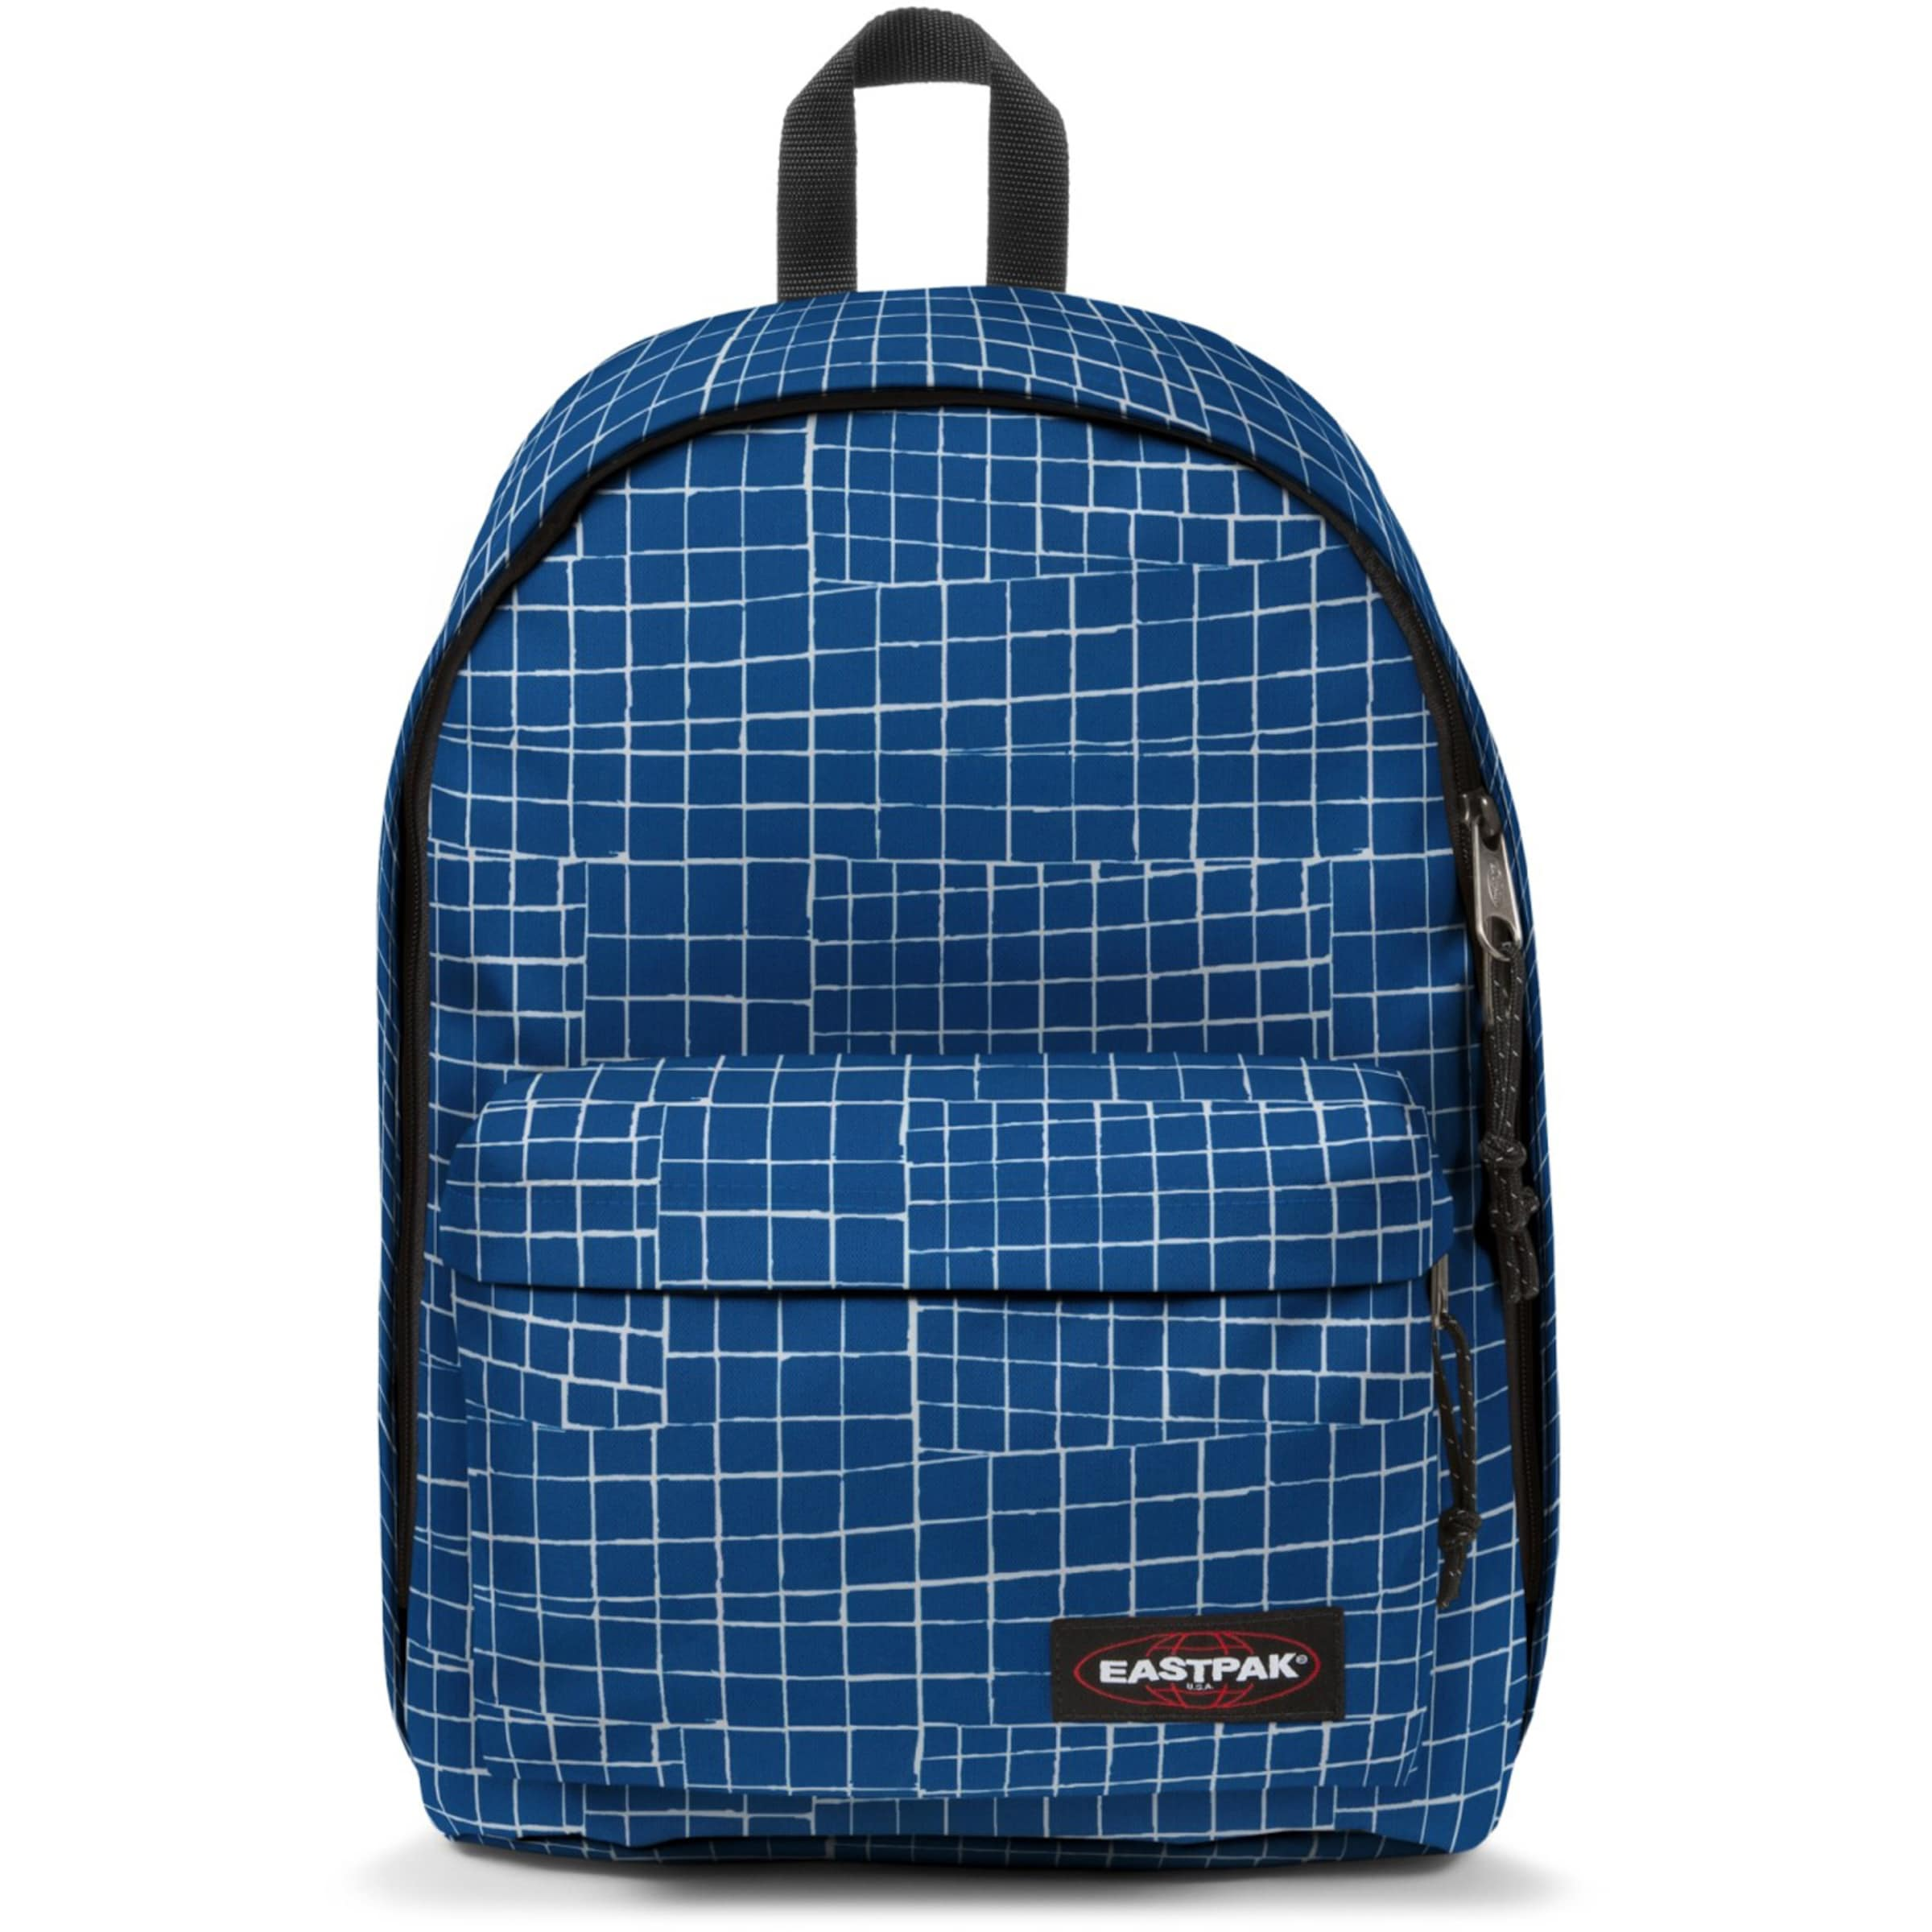 EASTPAK Authentic Collection X Out of Office Rucksack 44 cm Laptopfach Billig Bestseller Verkauf Rabatt Sast N5T7T